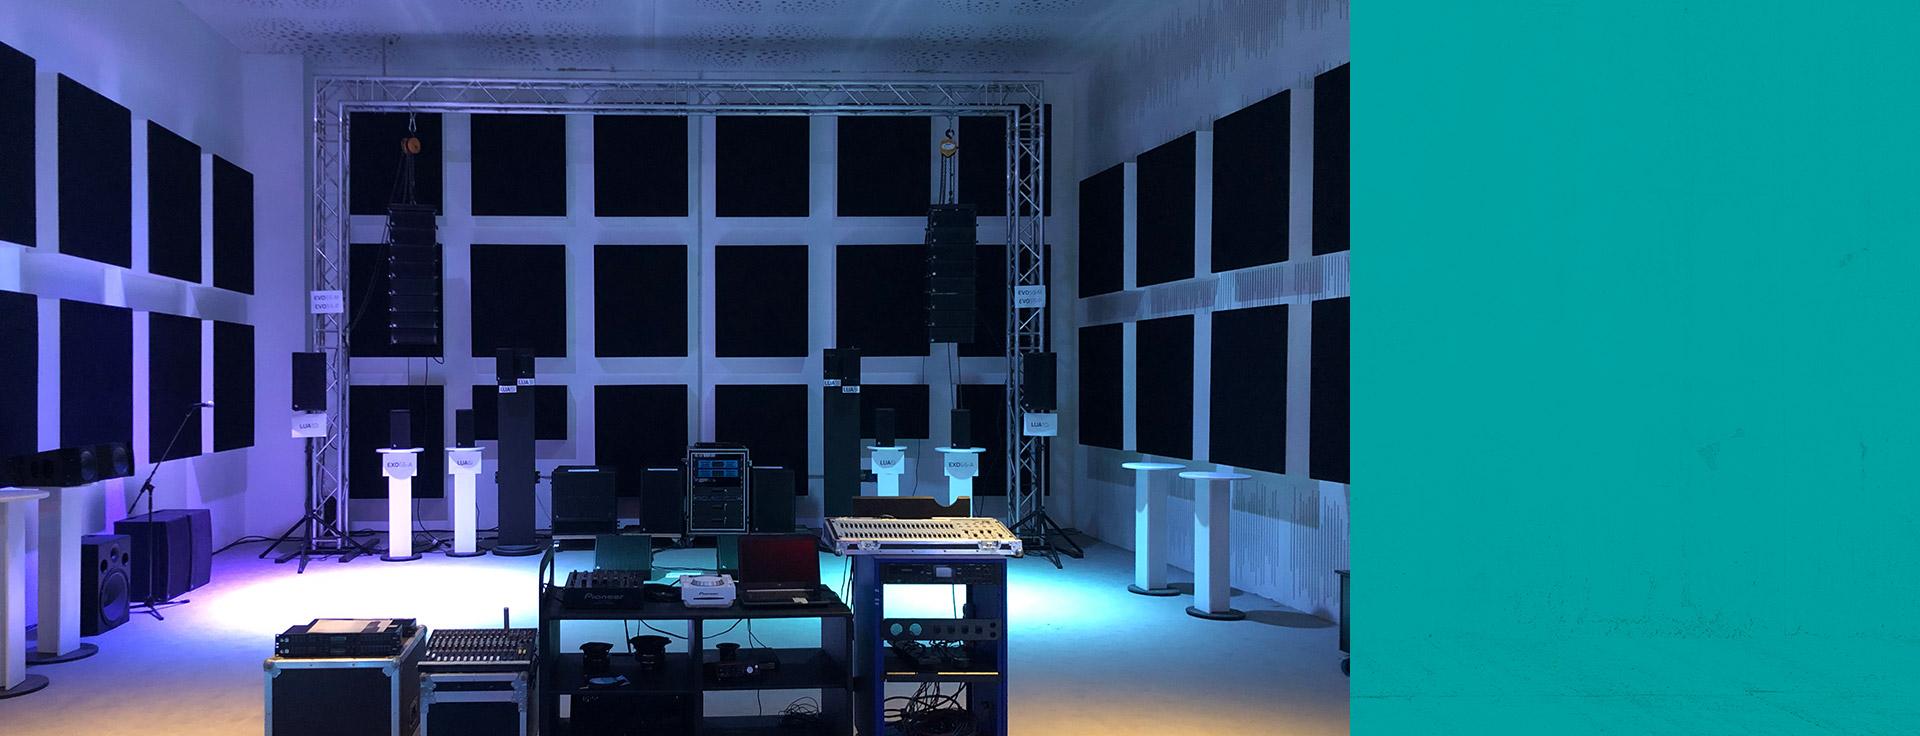 Demo-room2